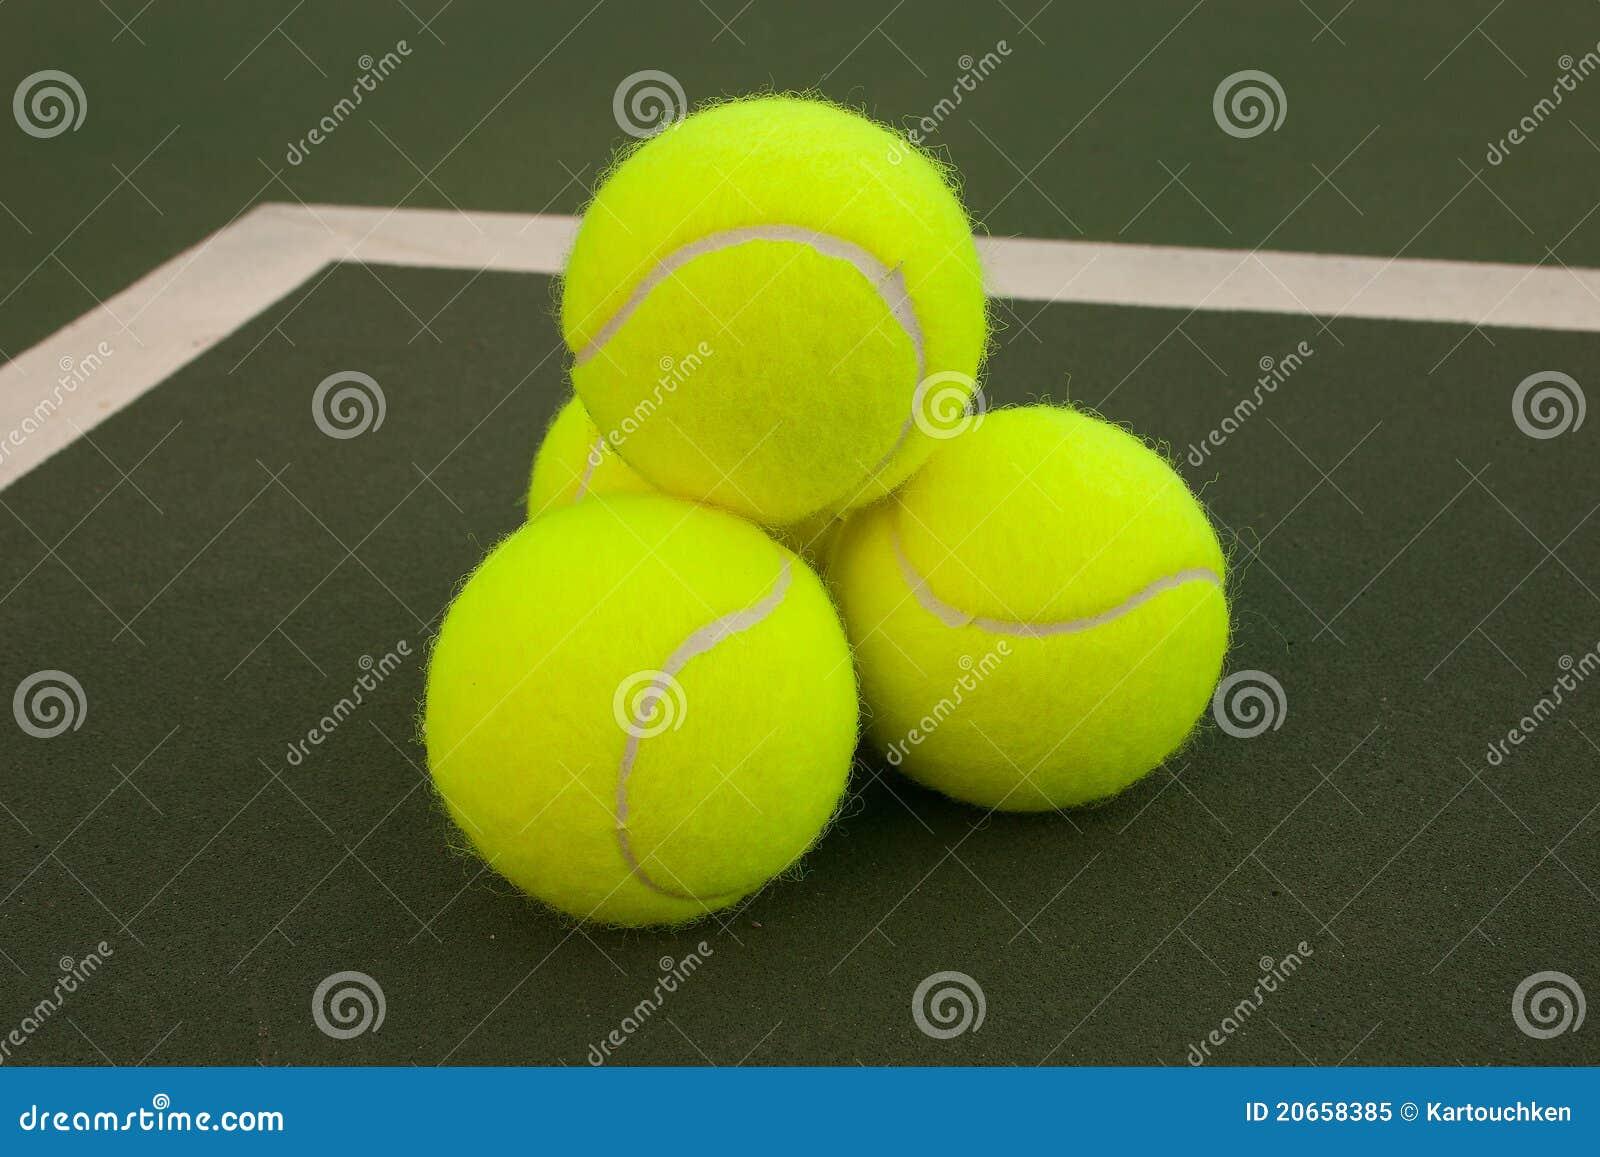 Yellow Tennis Balls 6 Royalty Free Stock Photo Image